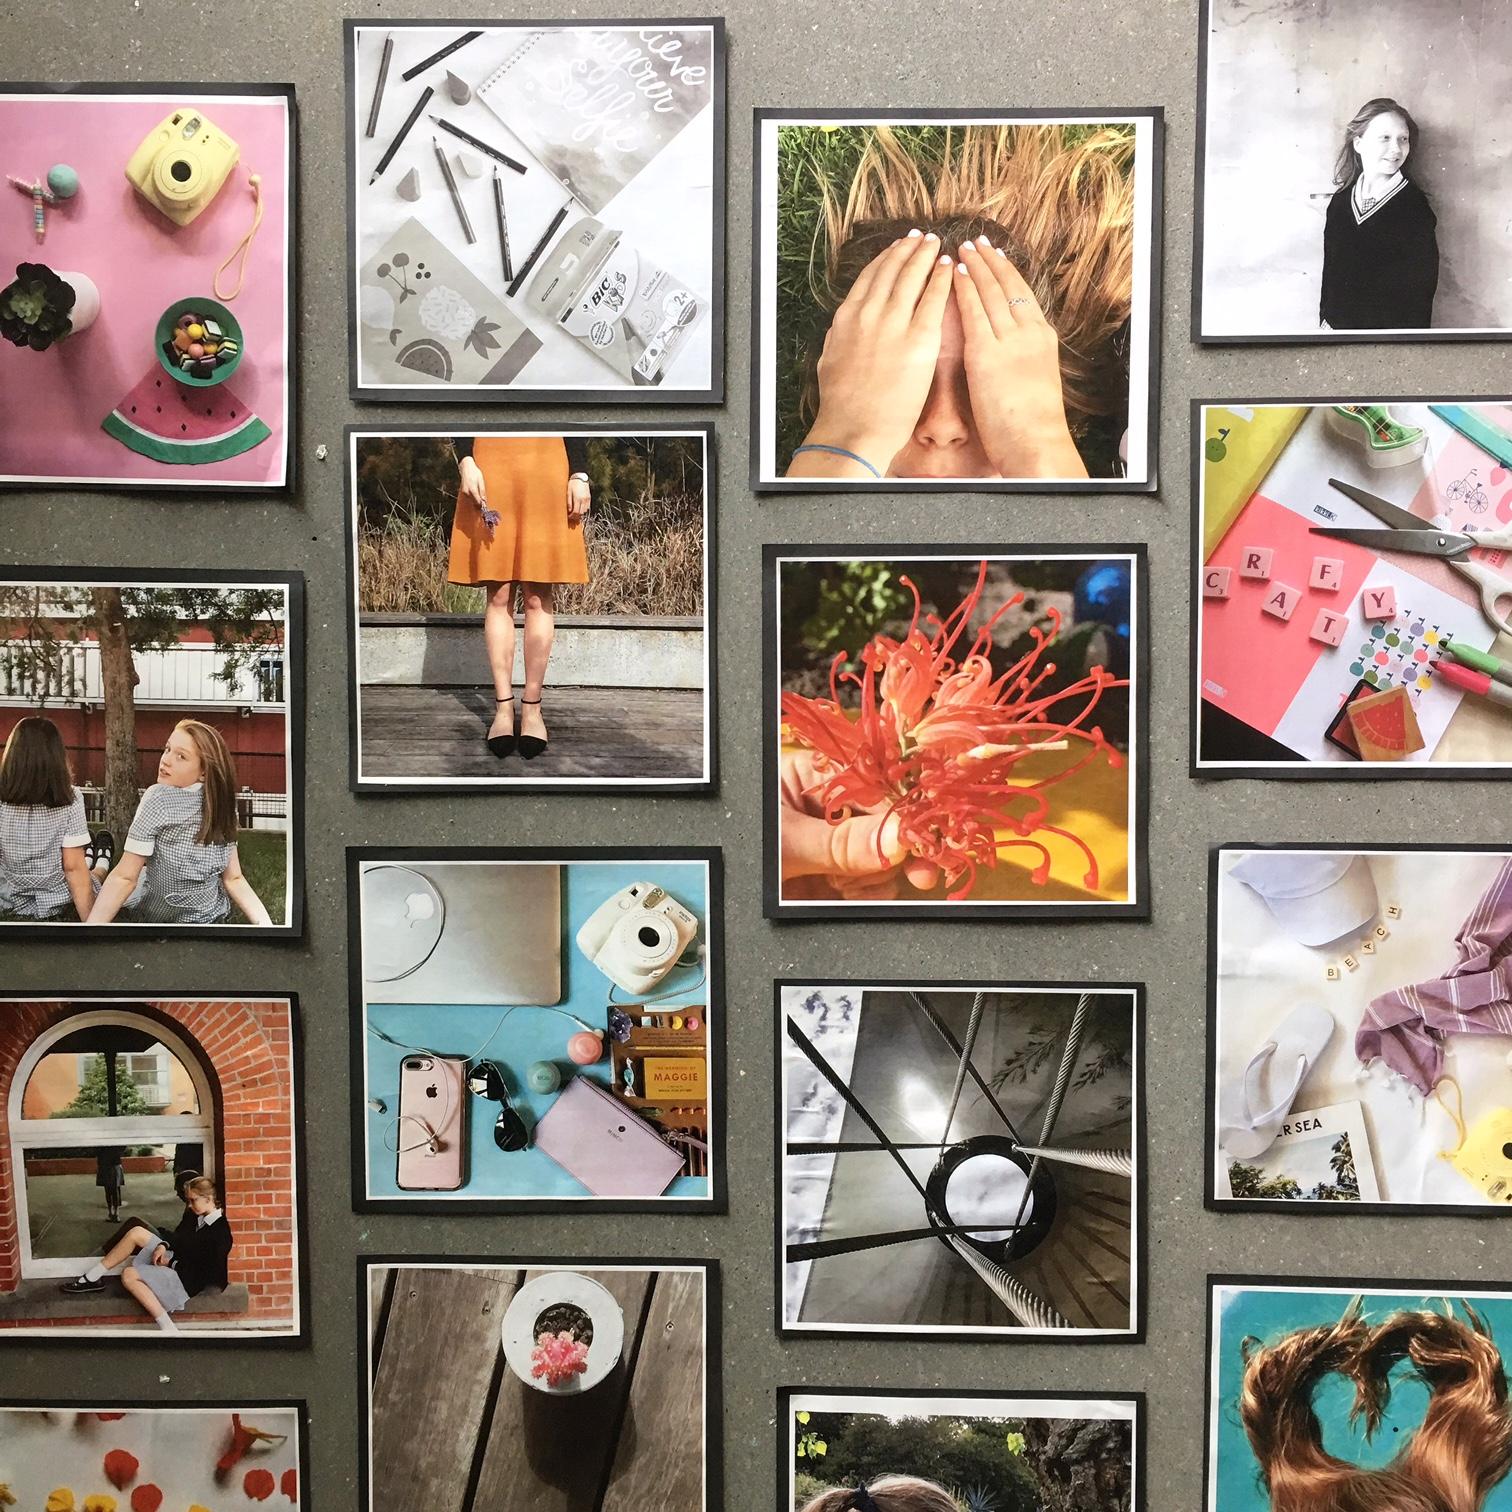 Yr 6 girls work on display in 'Wildfell'